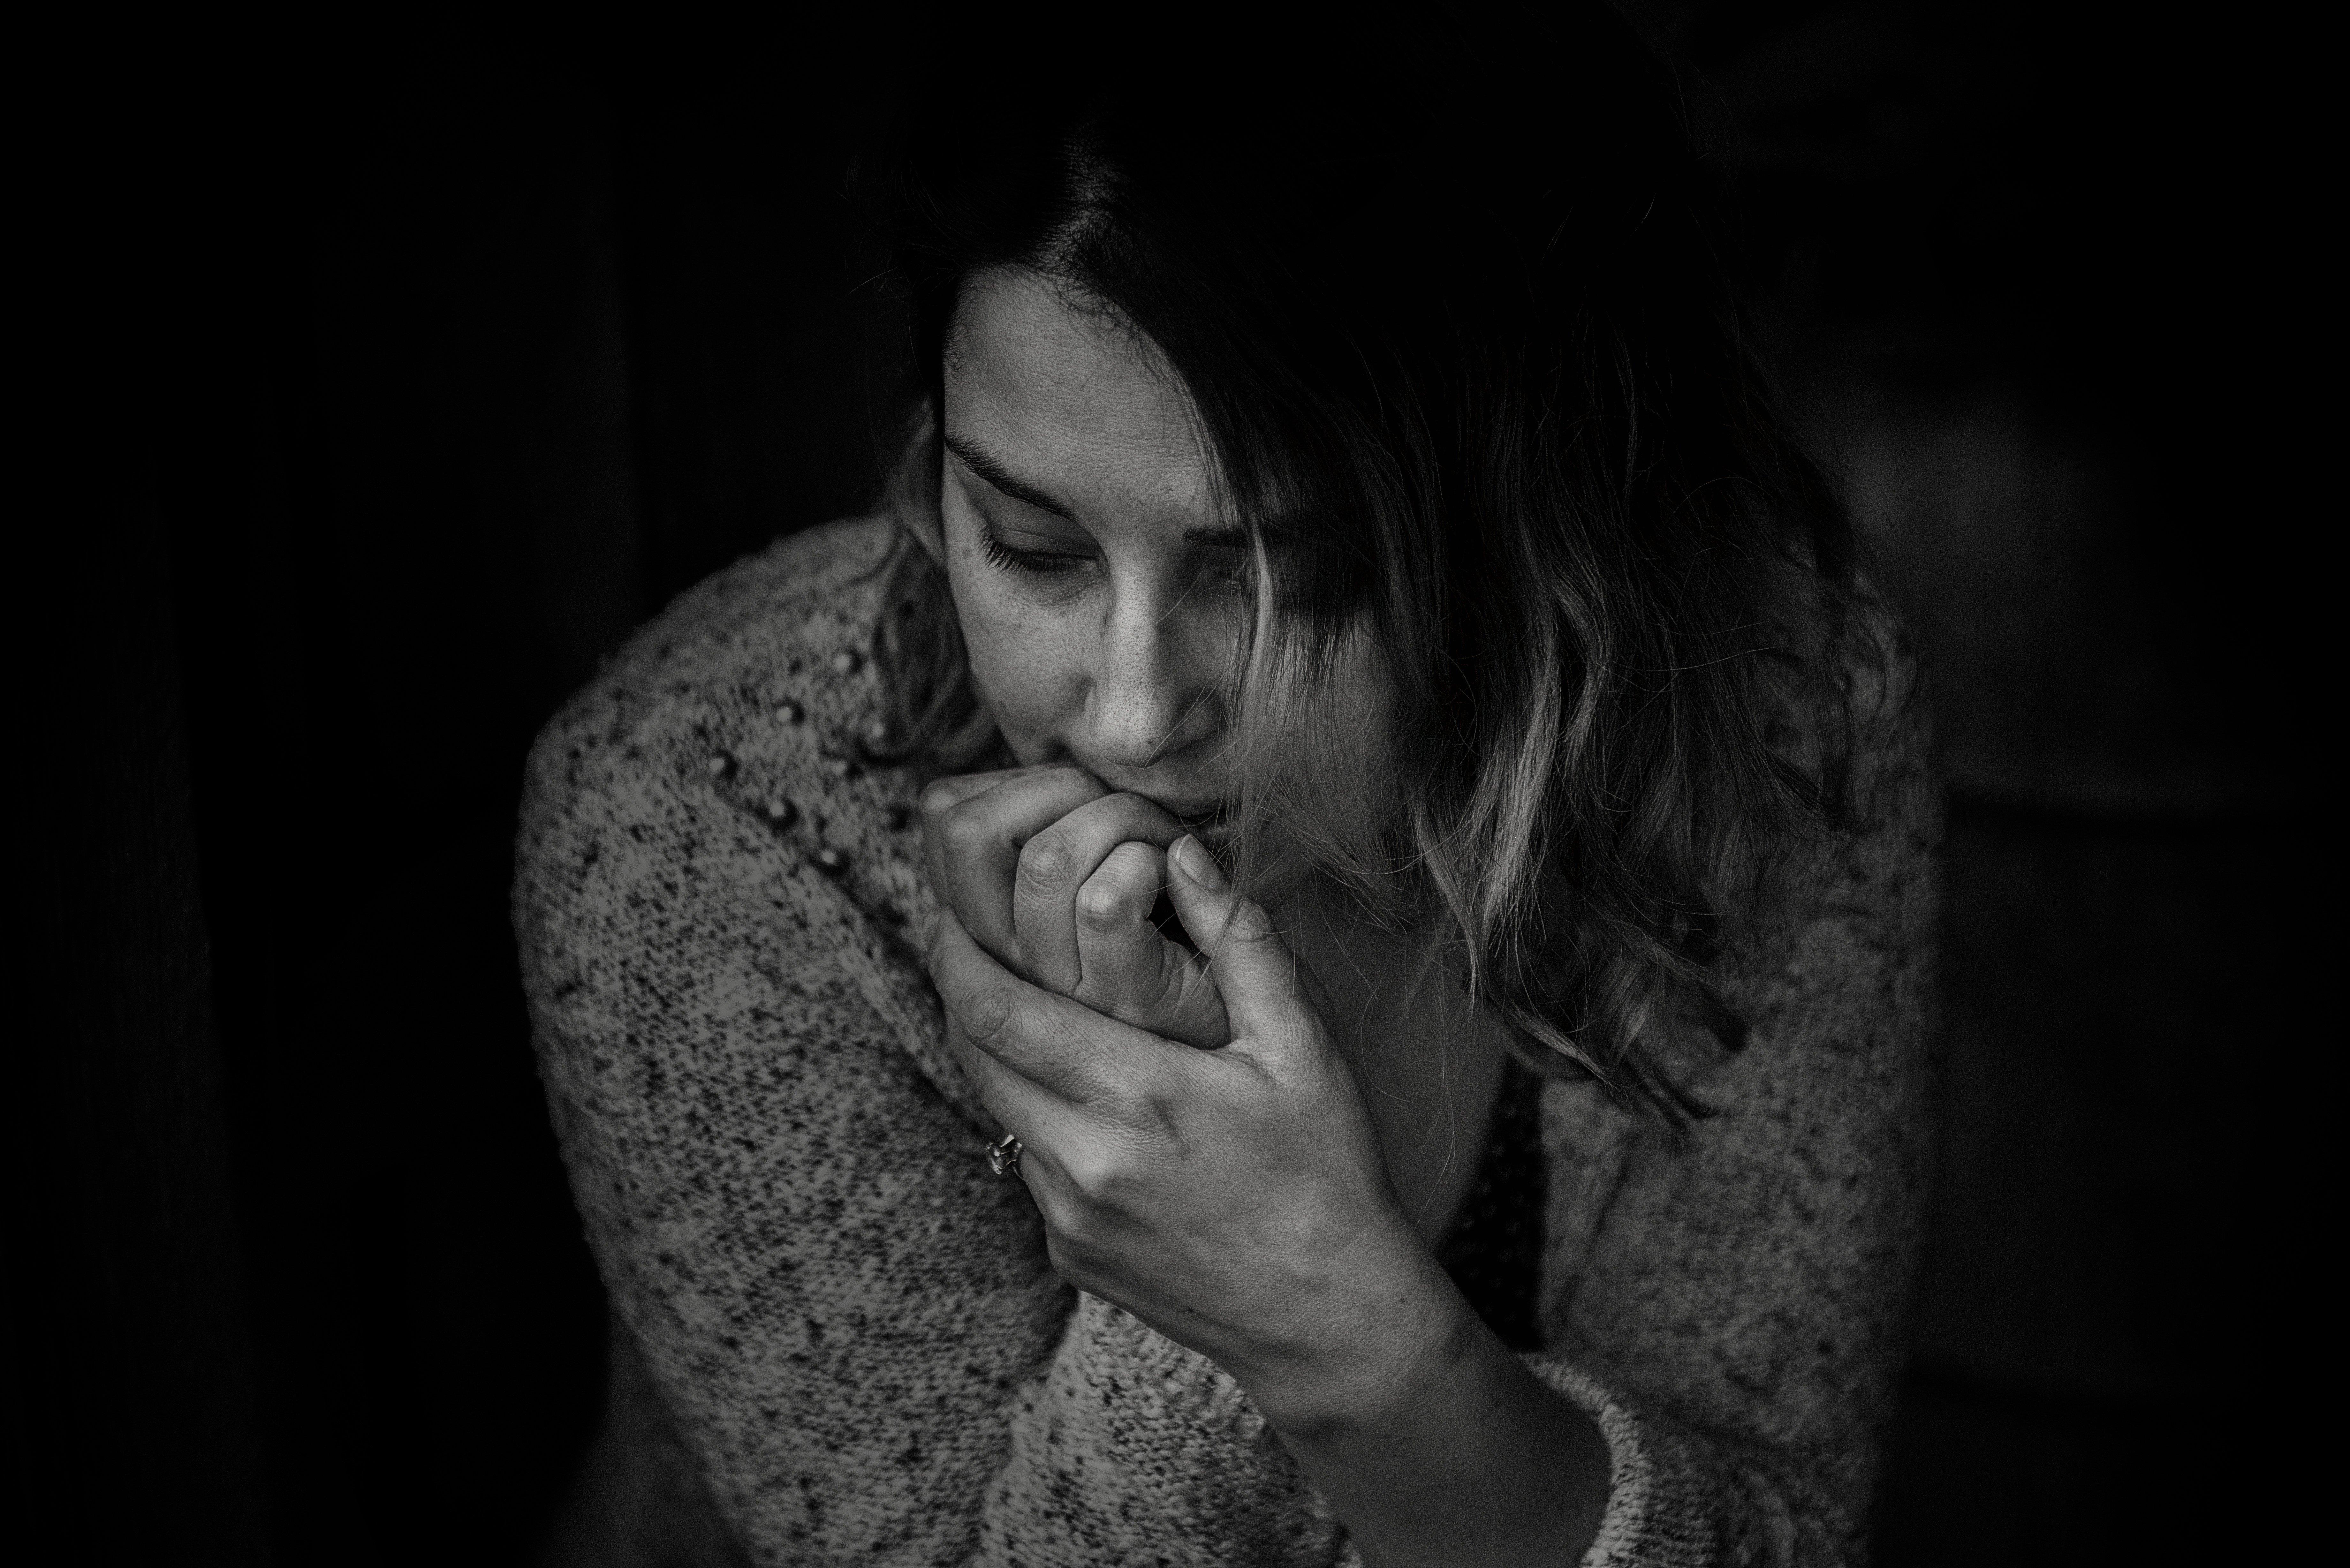 anxious-sad-woman-blackandwhite.jpeg